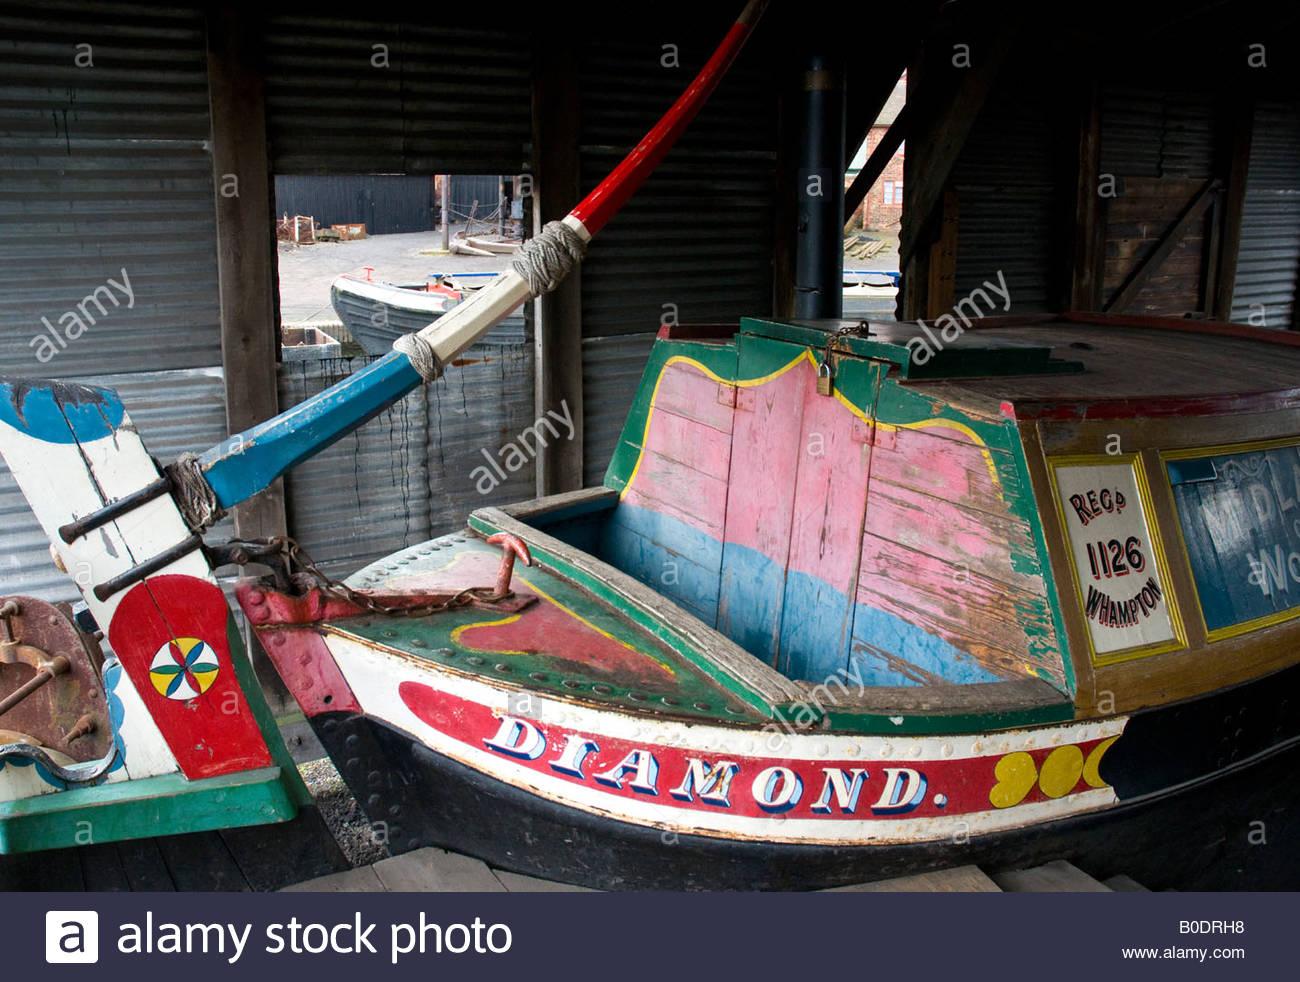 Black Narrowboat Stock Photos & Black Narrowboat Stock